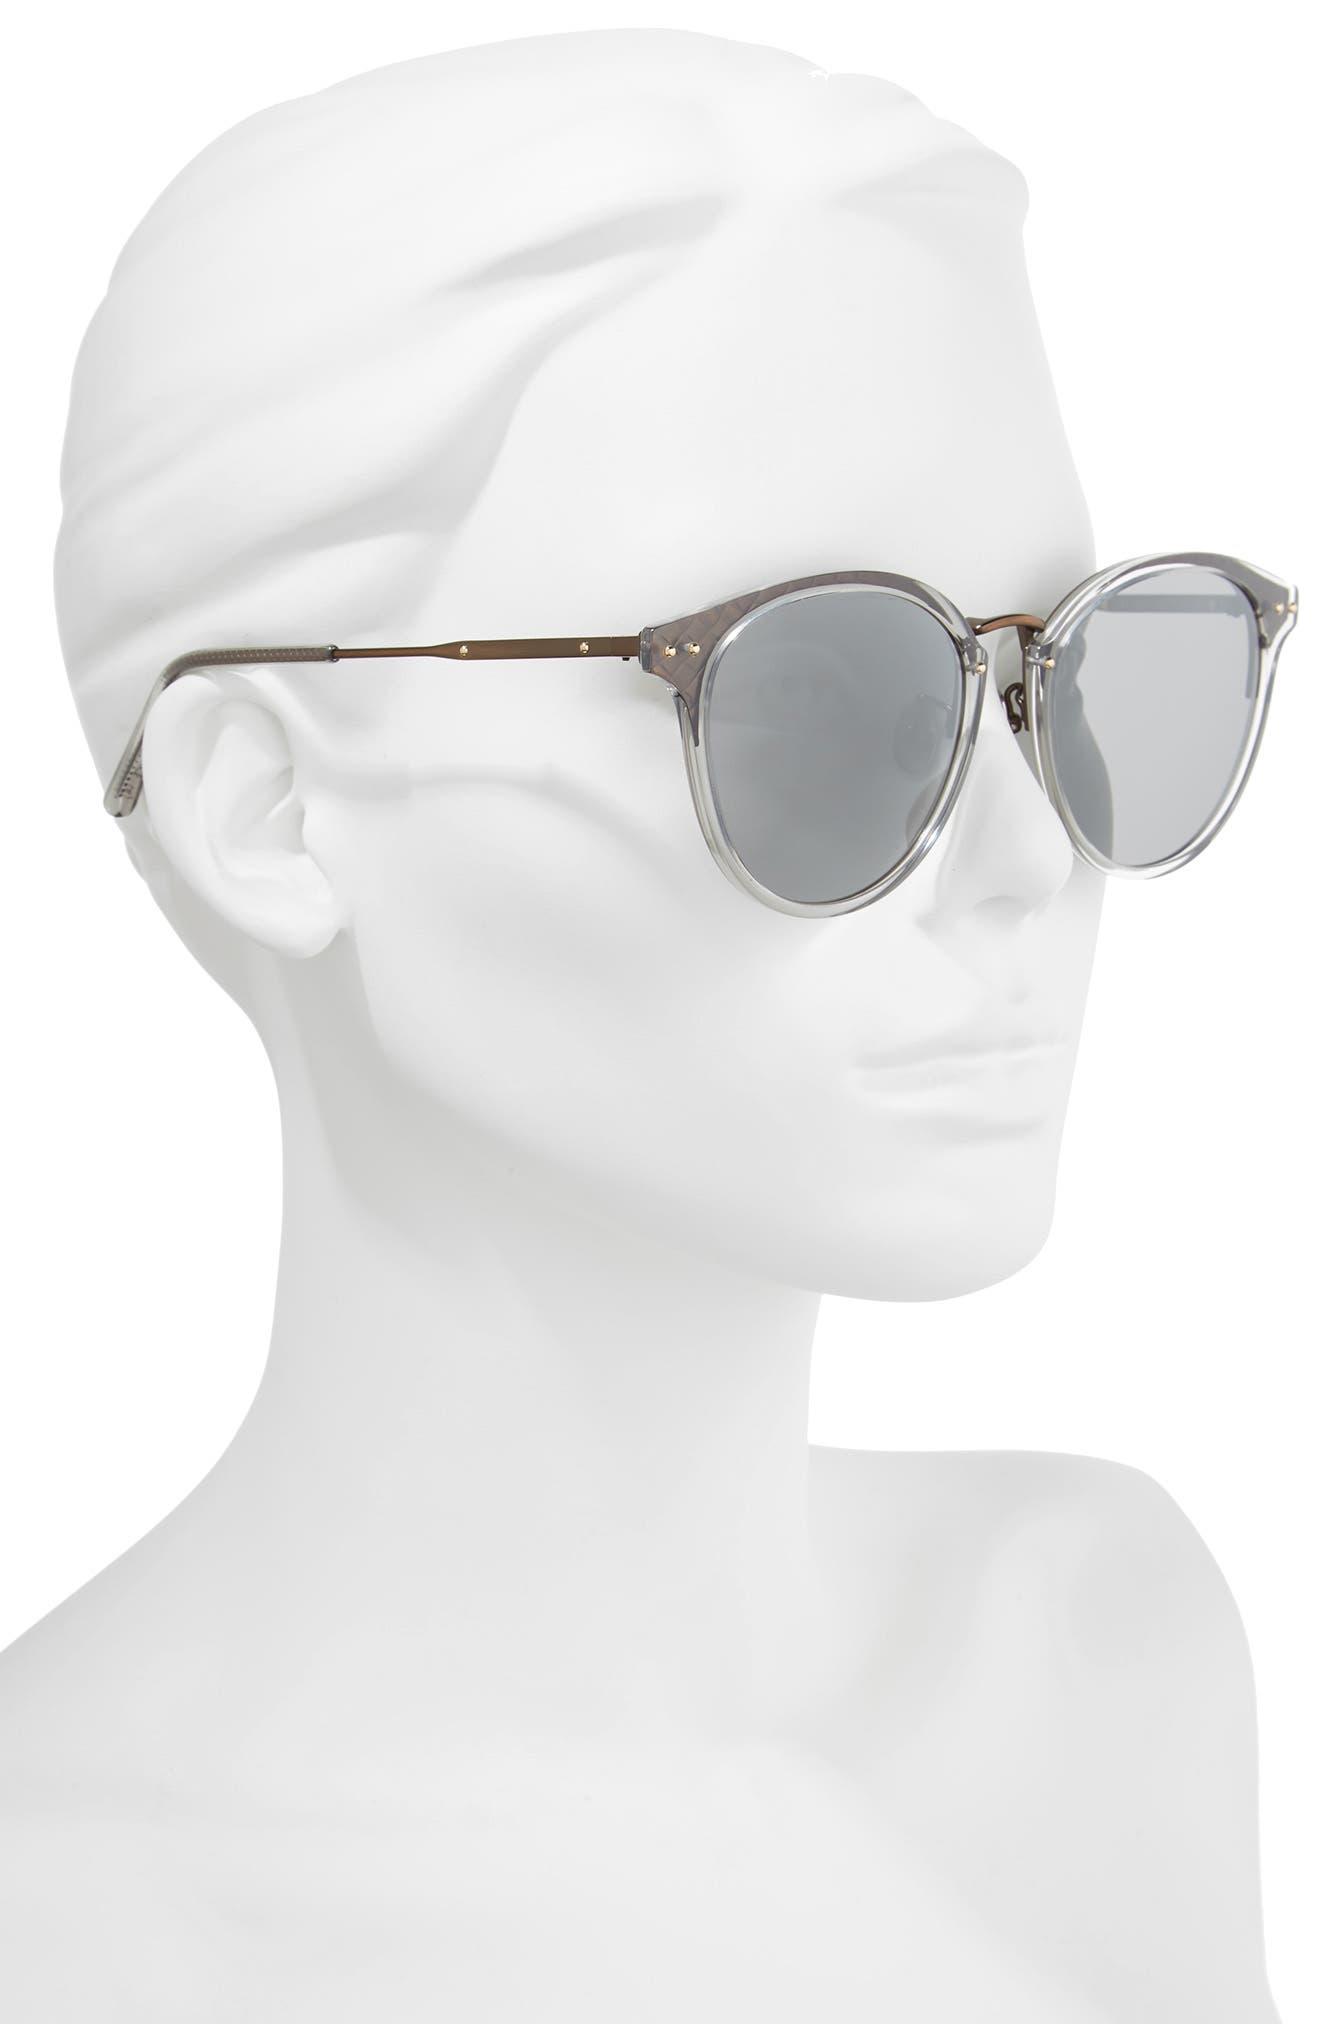 56mm Round Sunglasses,                             Alternate thumbnail 2, color,                             Black